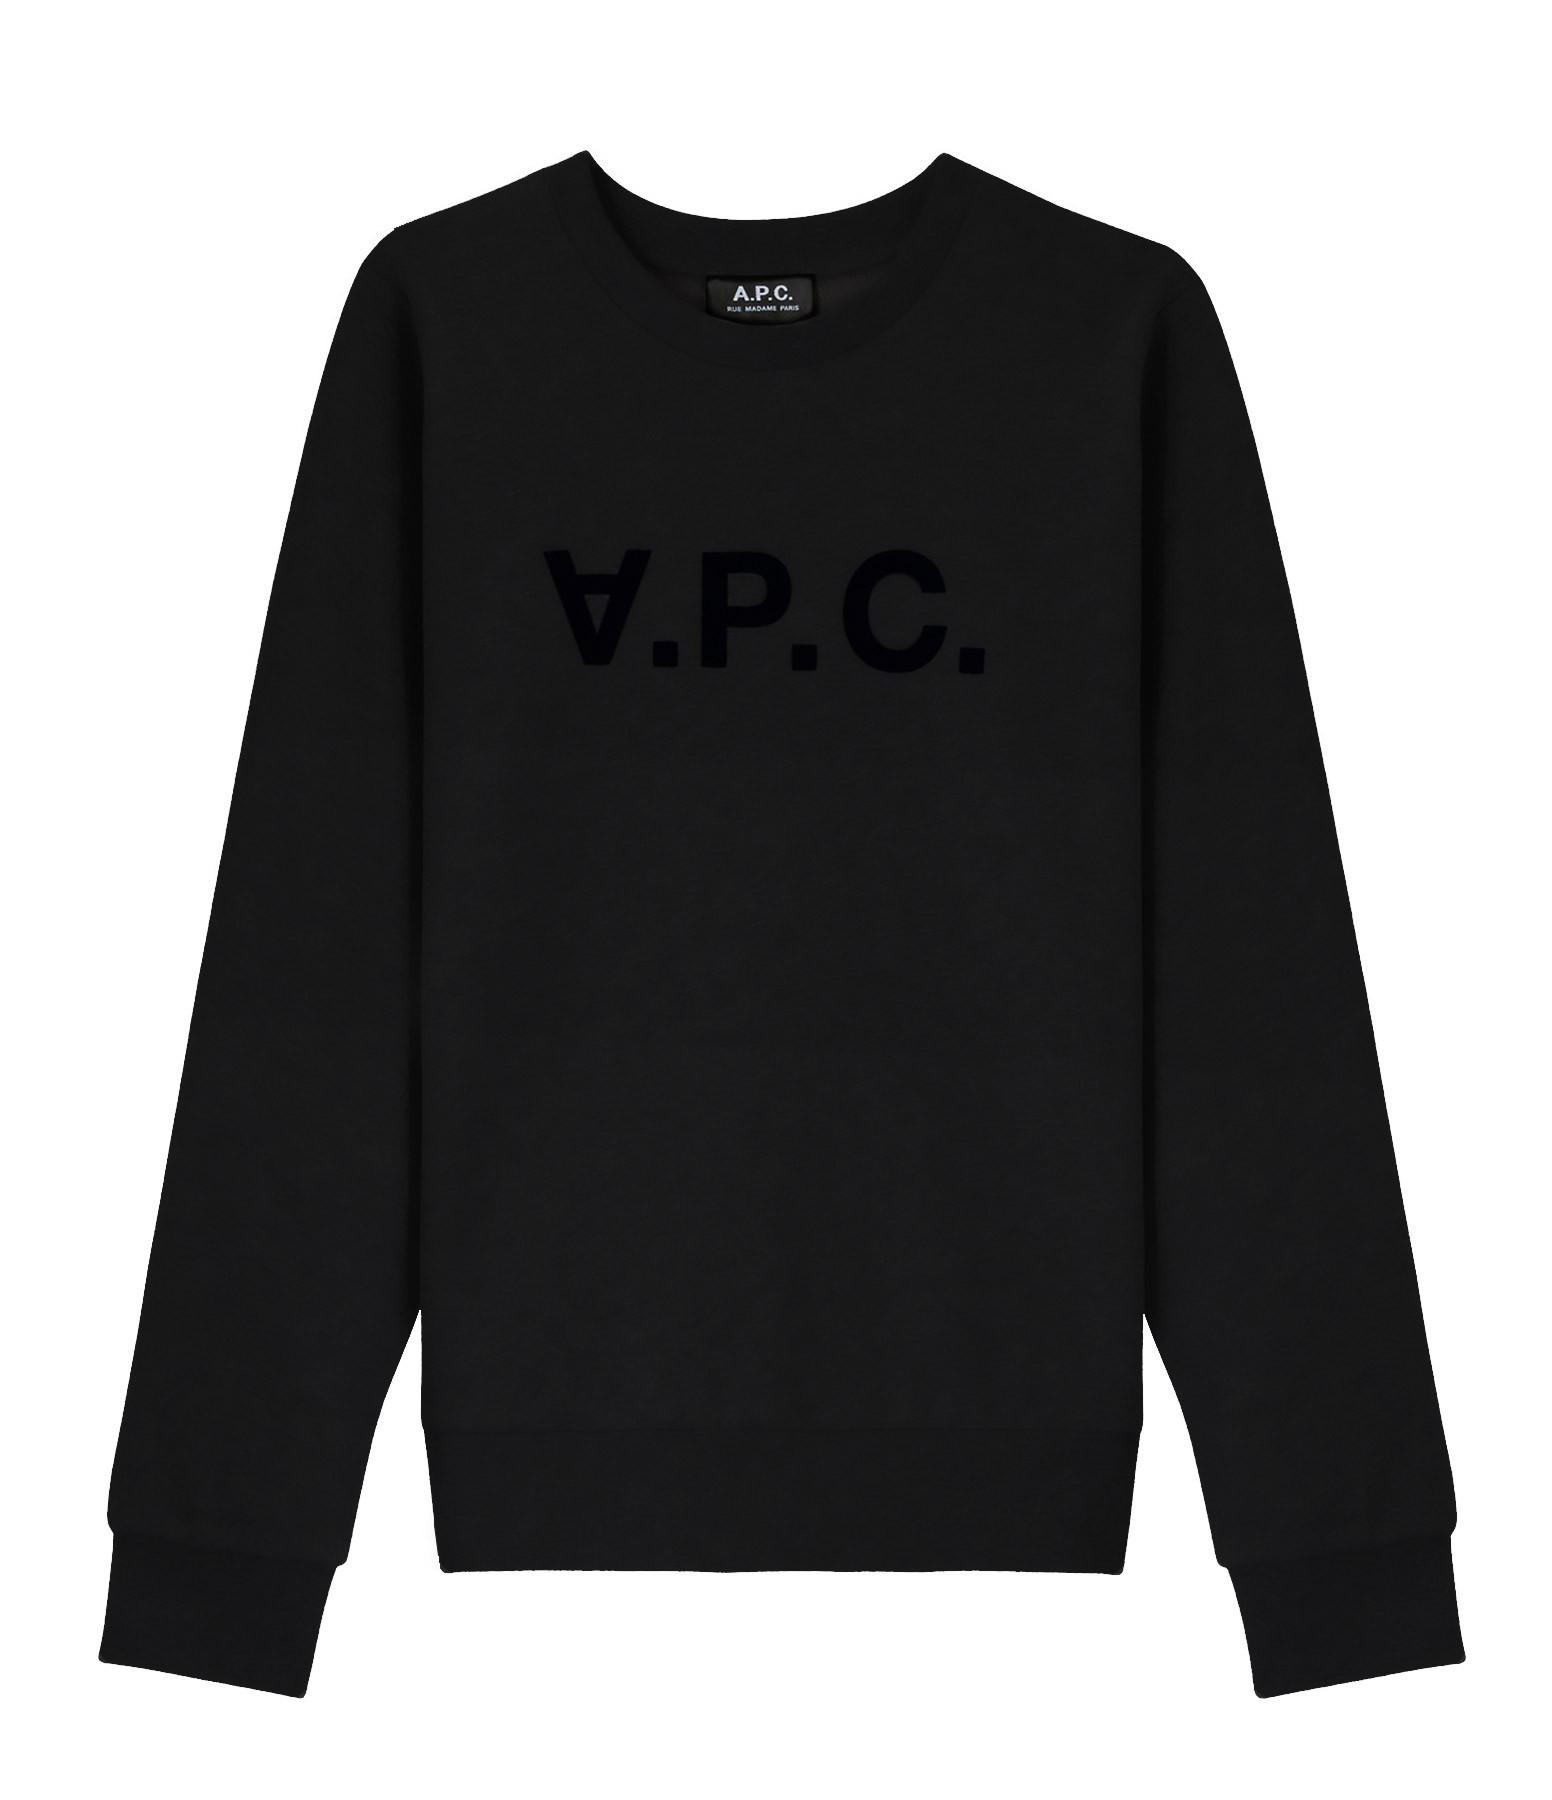 A.P.C. - Sweatshirt Viva Noir